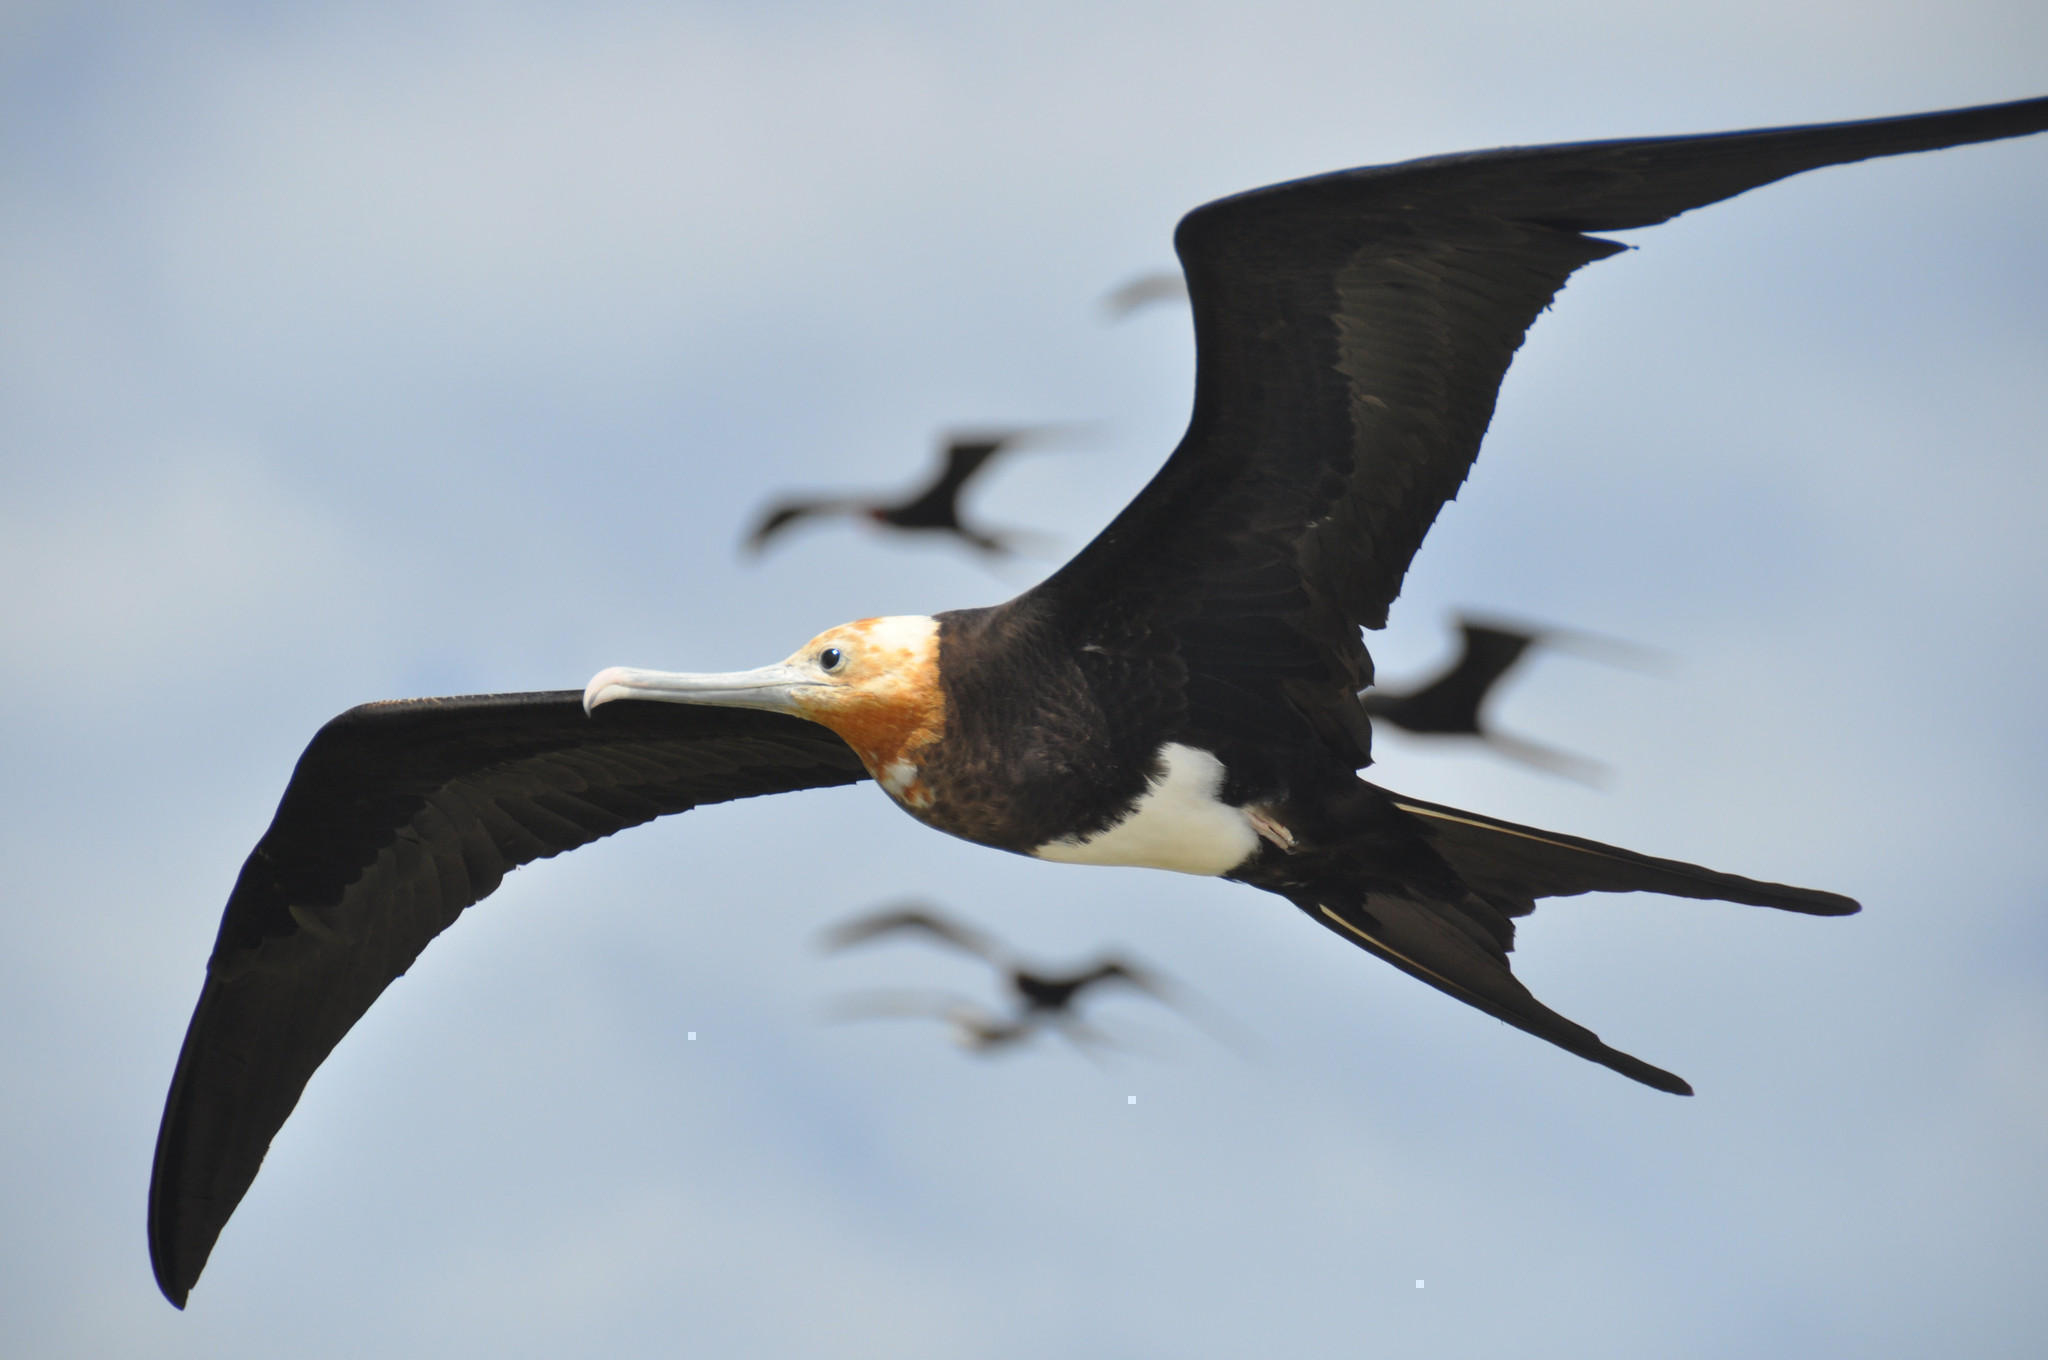 Frigate bird speed jpg free library 10 Fastest Animals on Earth - puremedia.info jpg free library